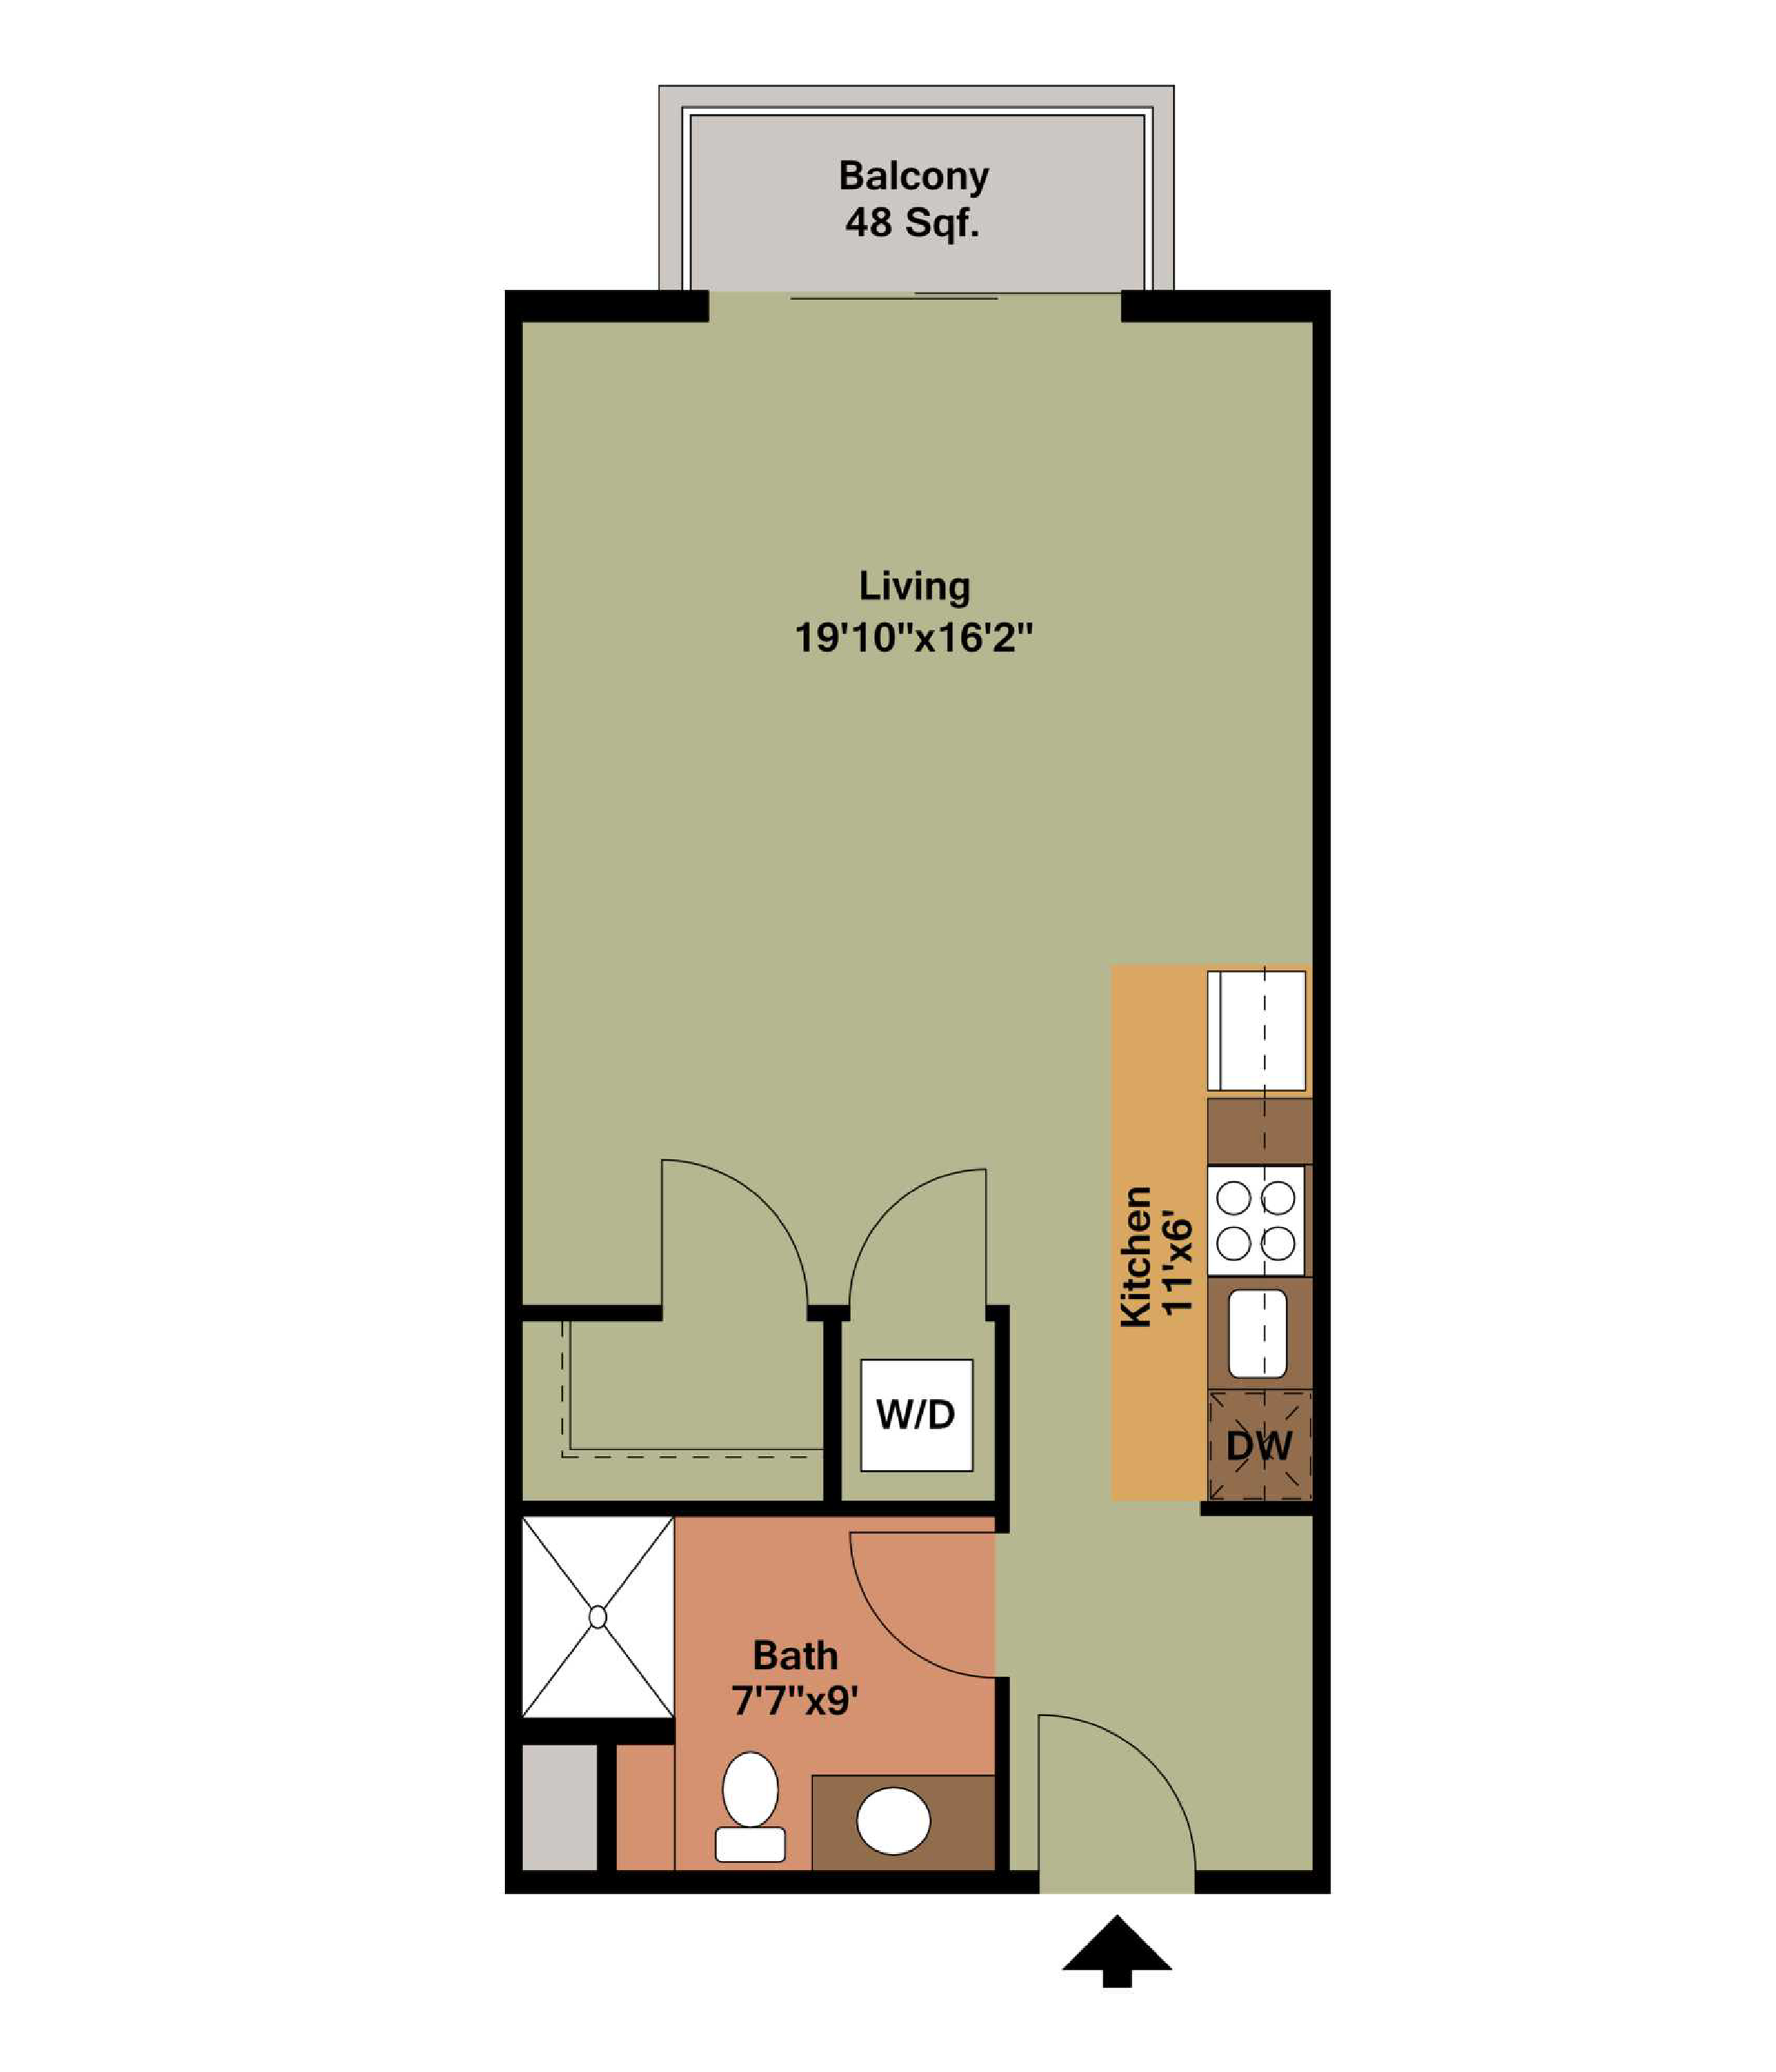 MOSCOW MULE - studio   1 bathroom510 square feet$1,150 - 1,425